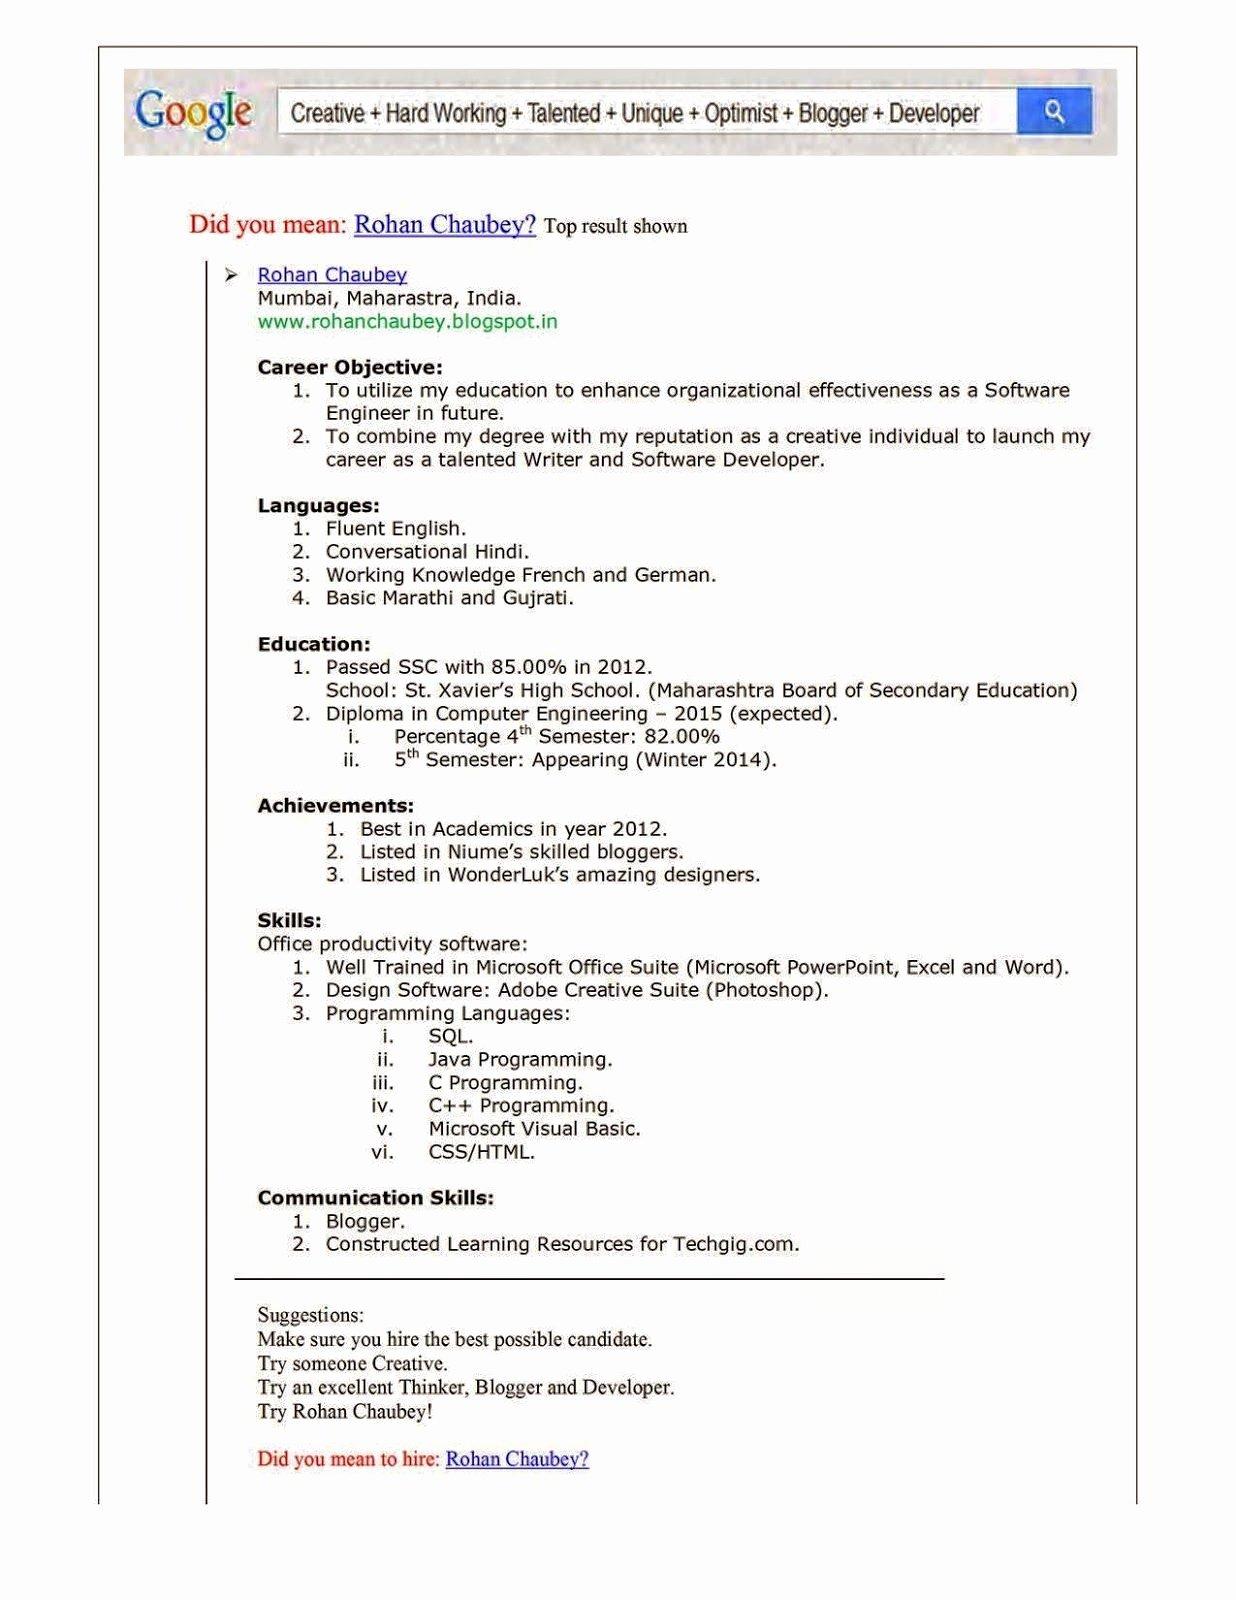 Free Line Resume Creator Luxury Resume for software